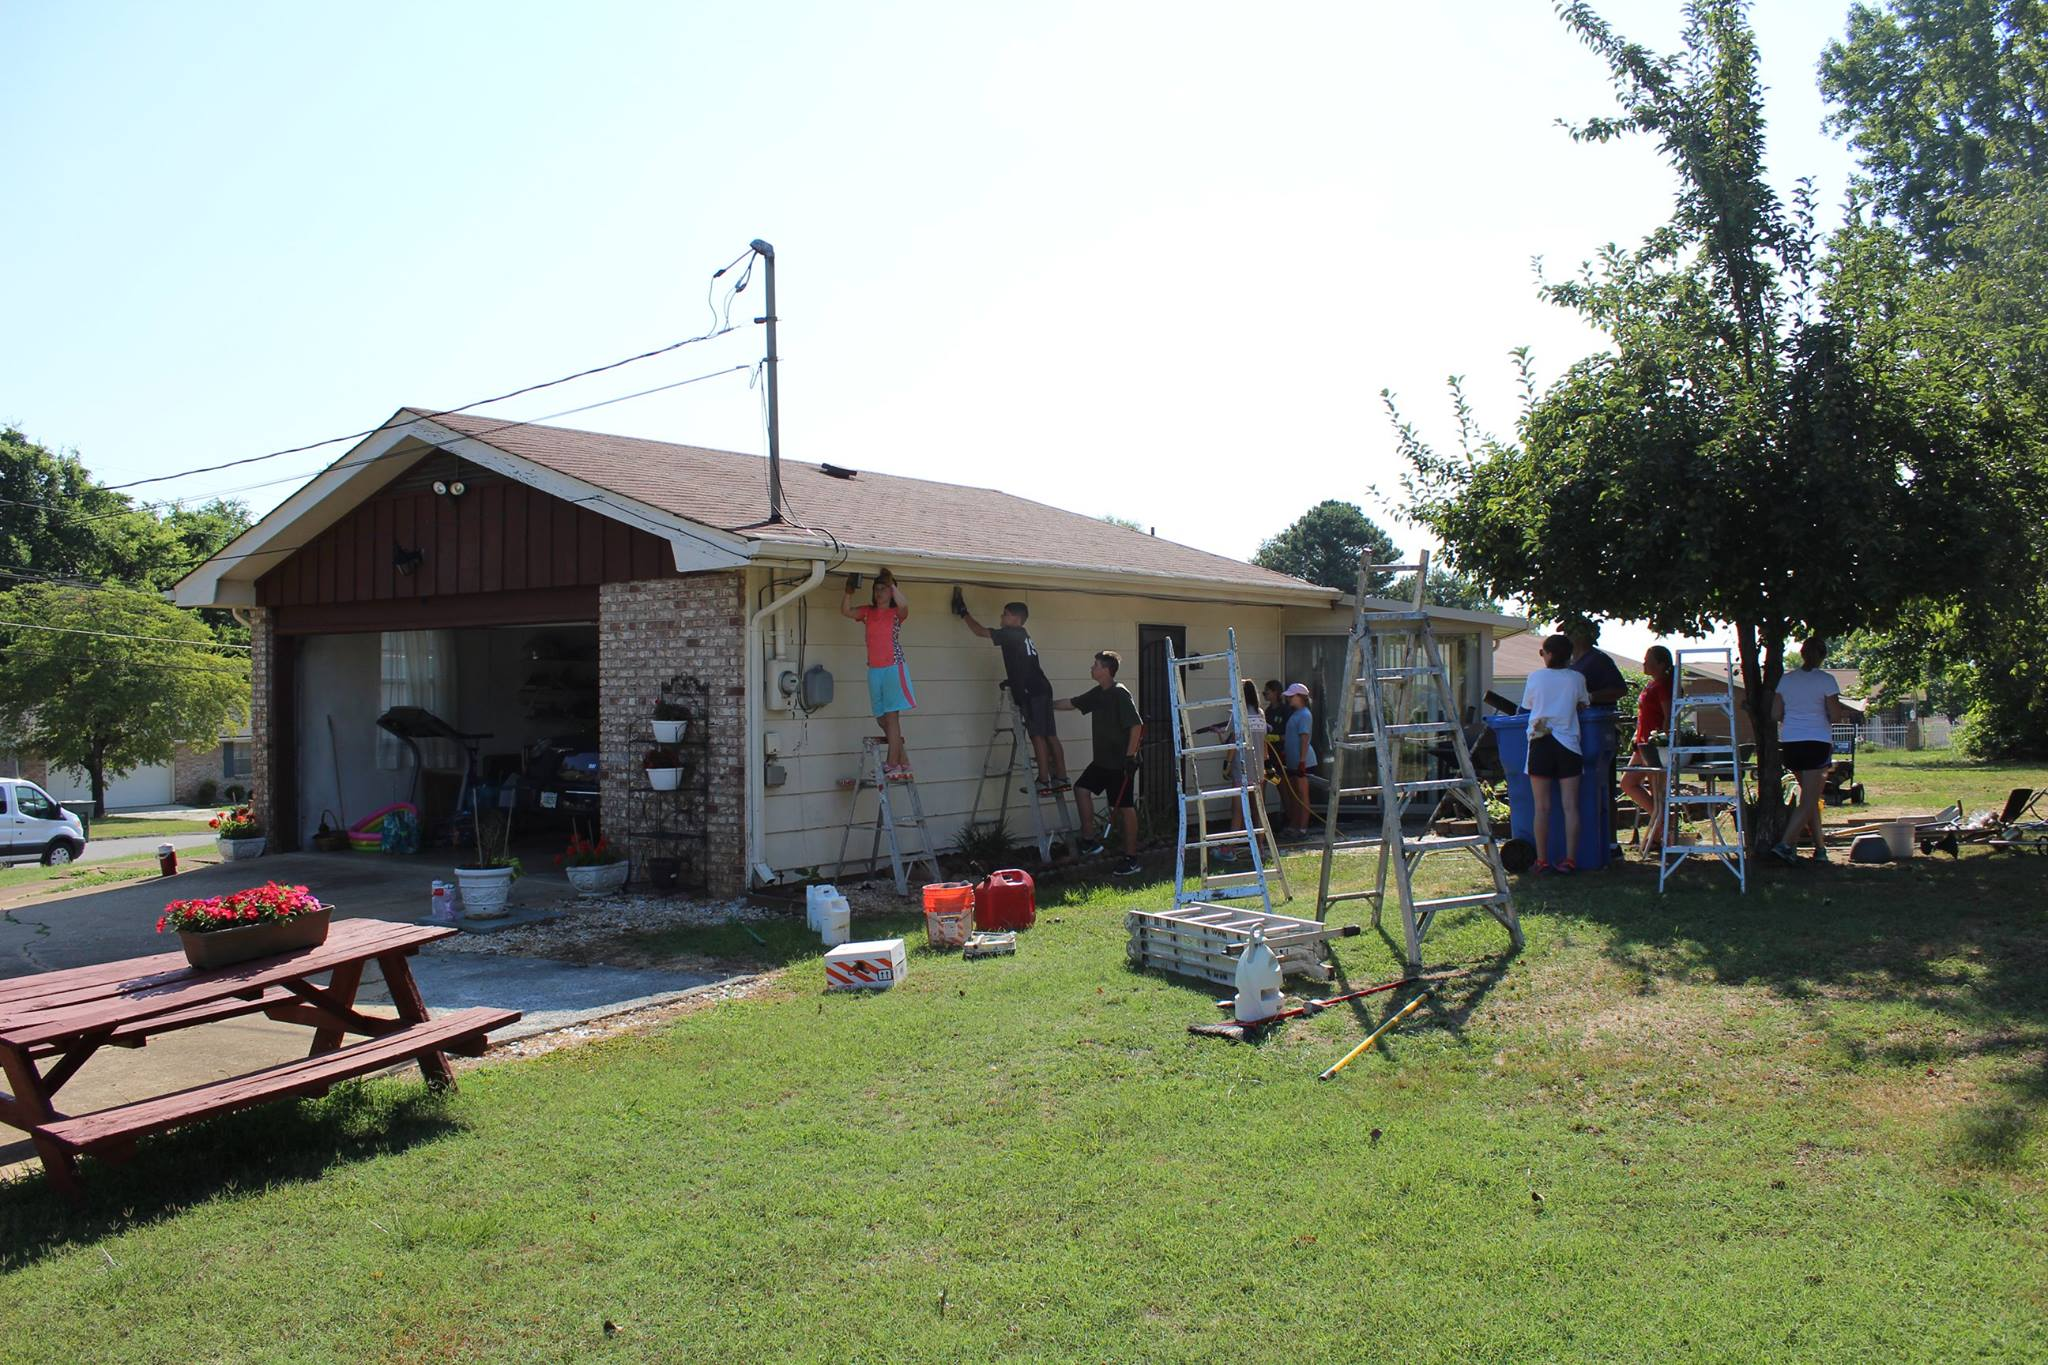 Chattanooga2016_06.29.16_WH_01.jpg